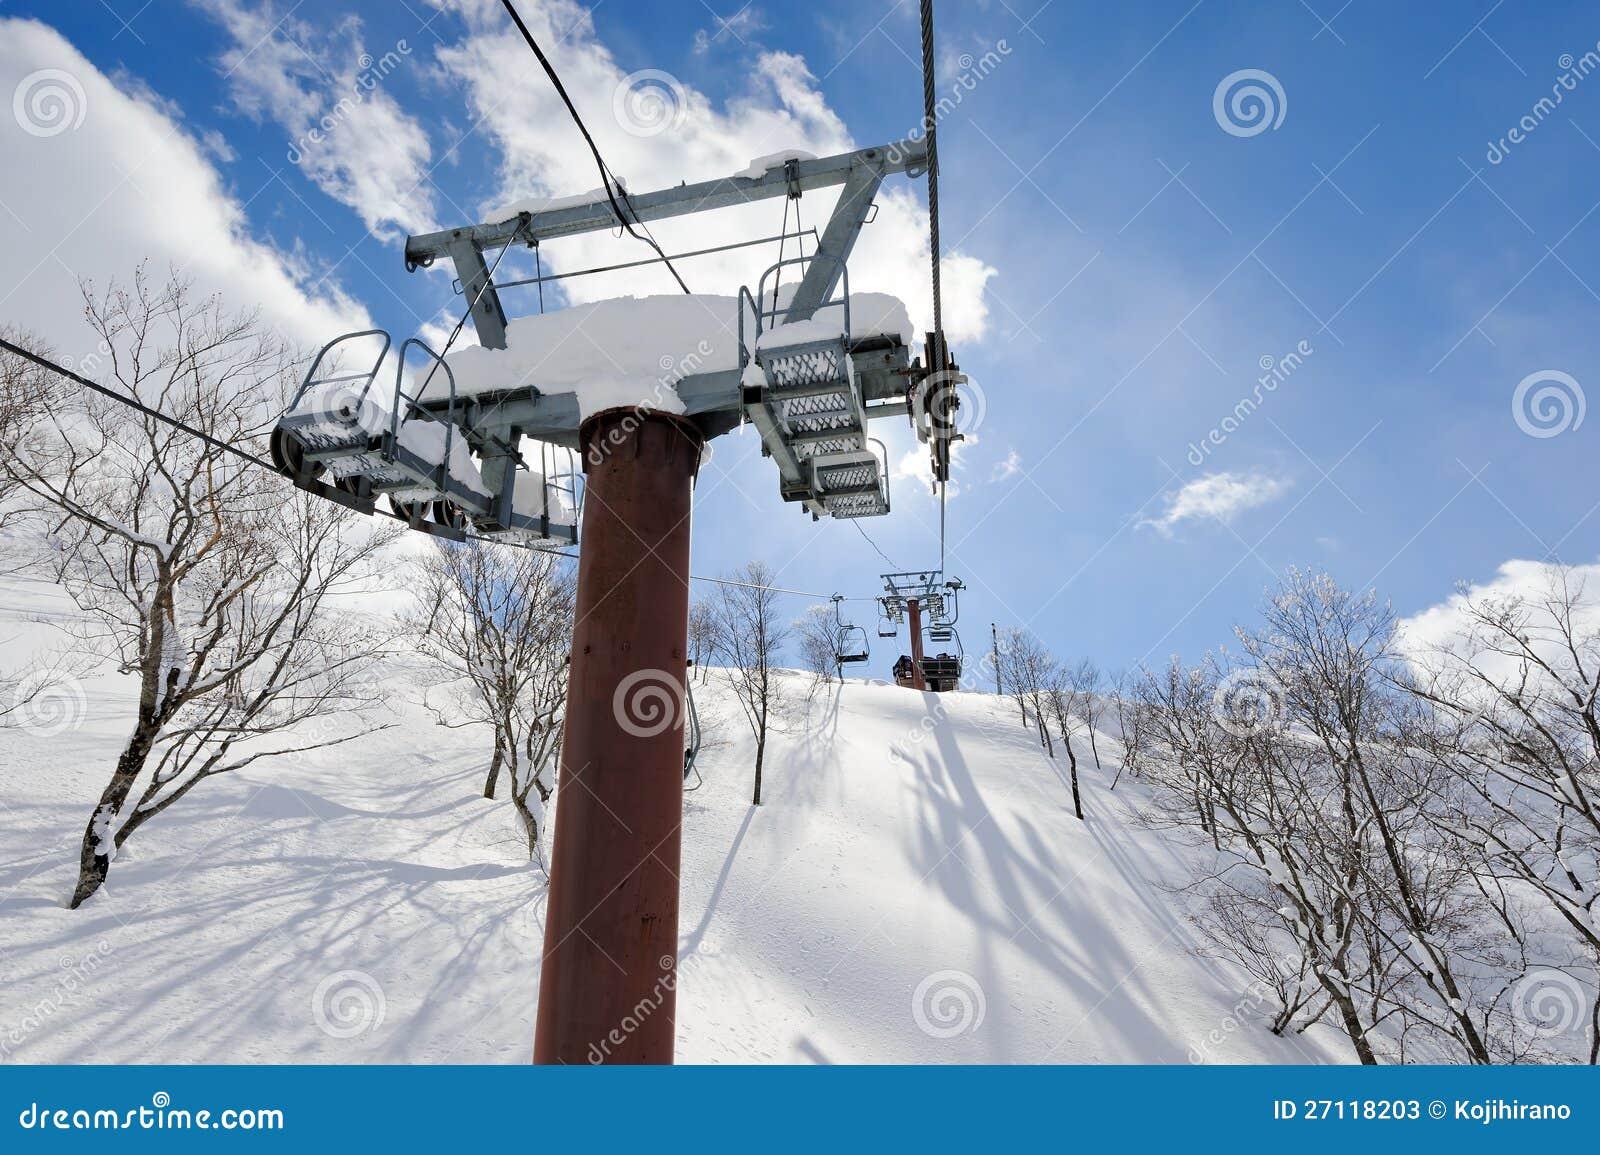 Ski Chairlift Stock Photos Image 27118203